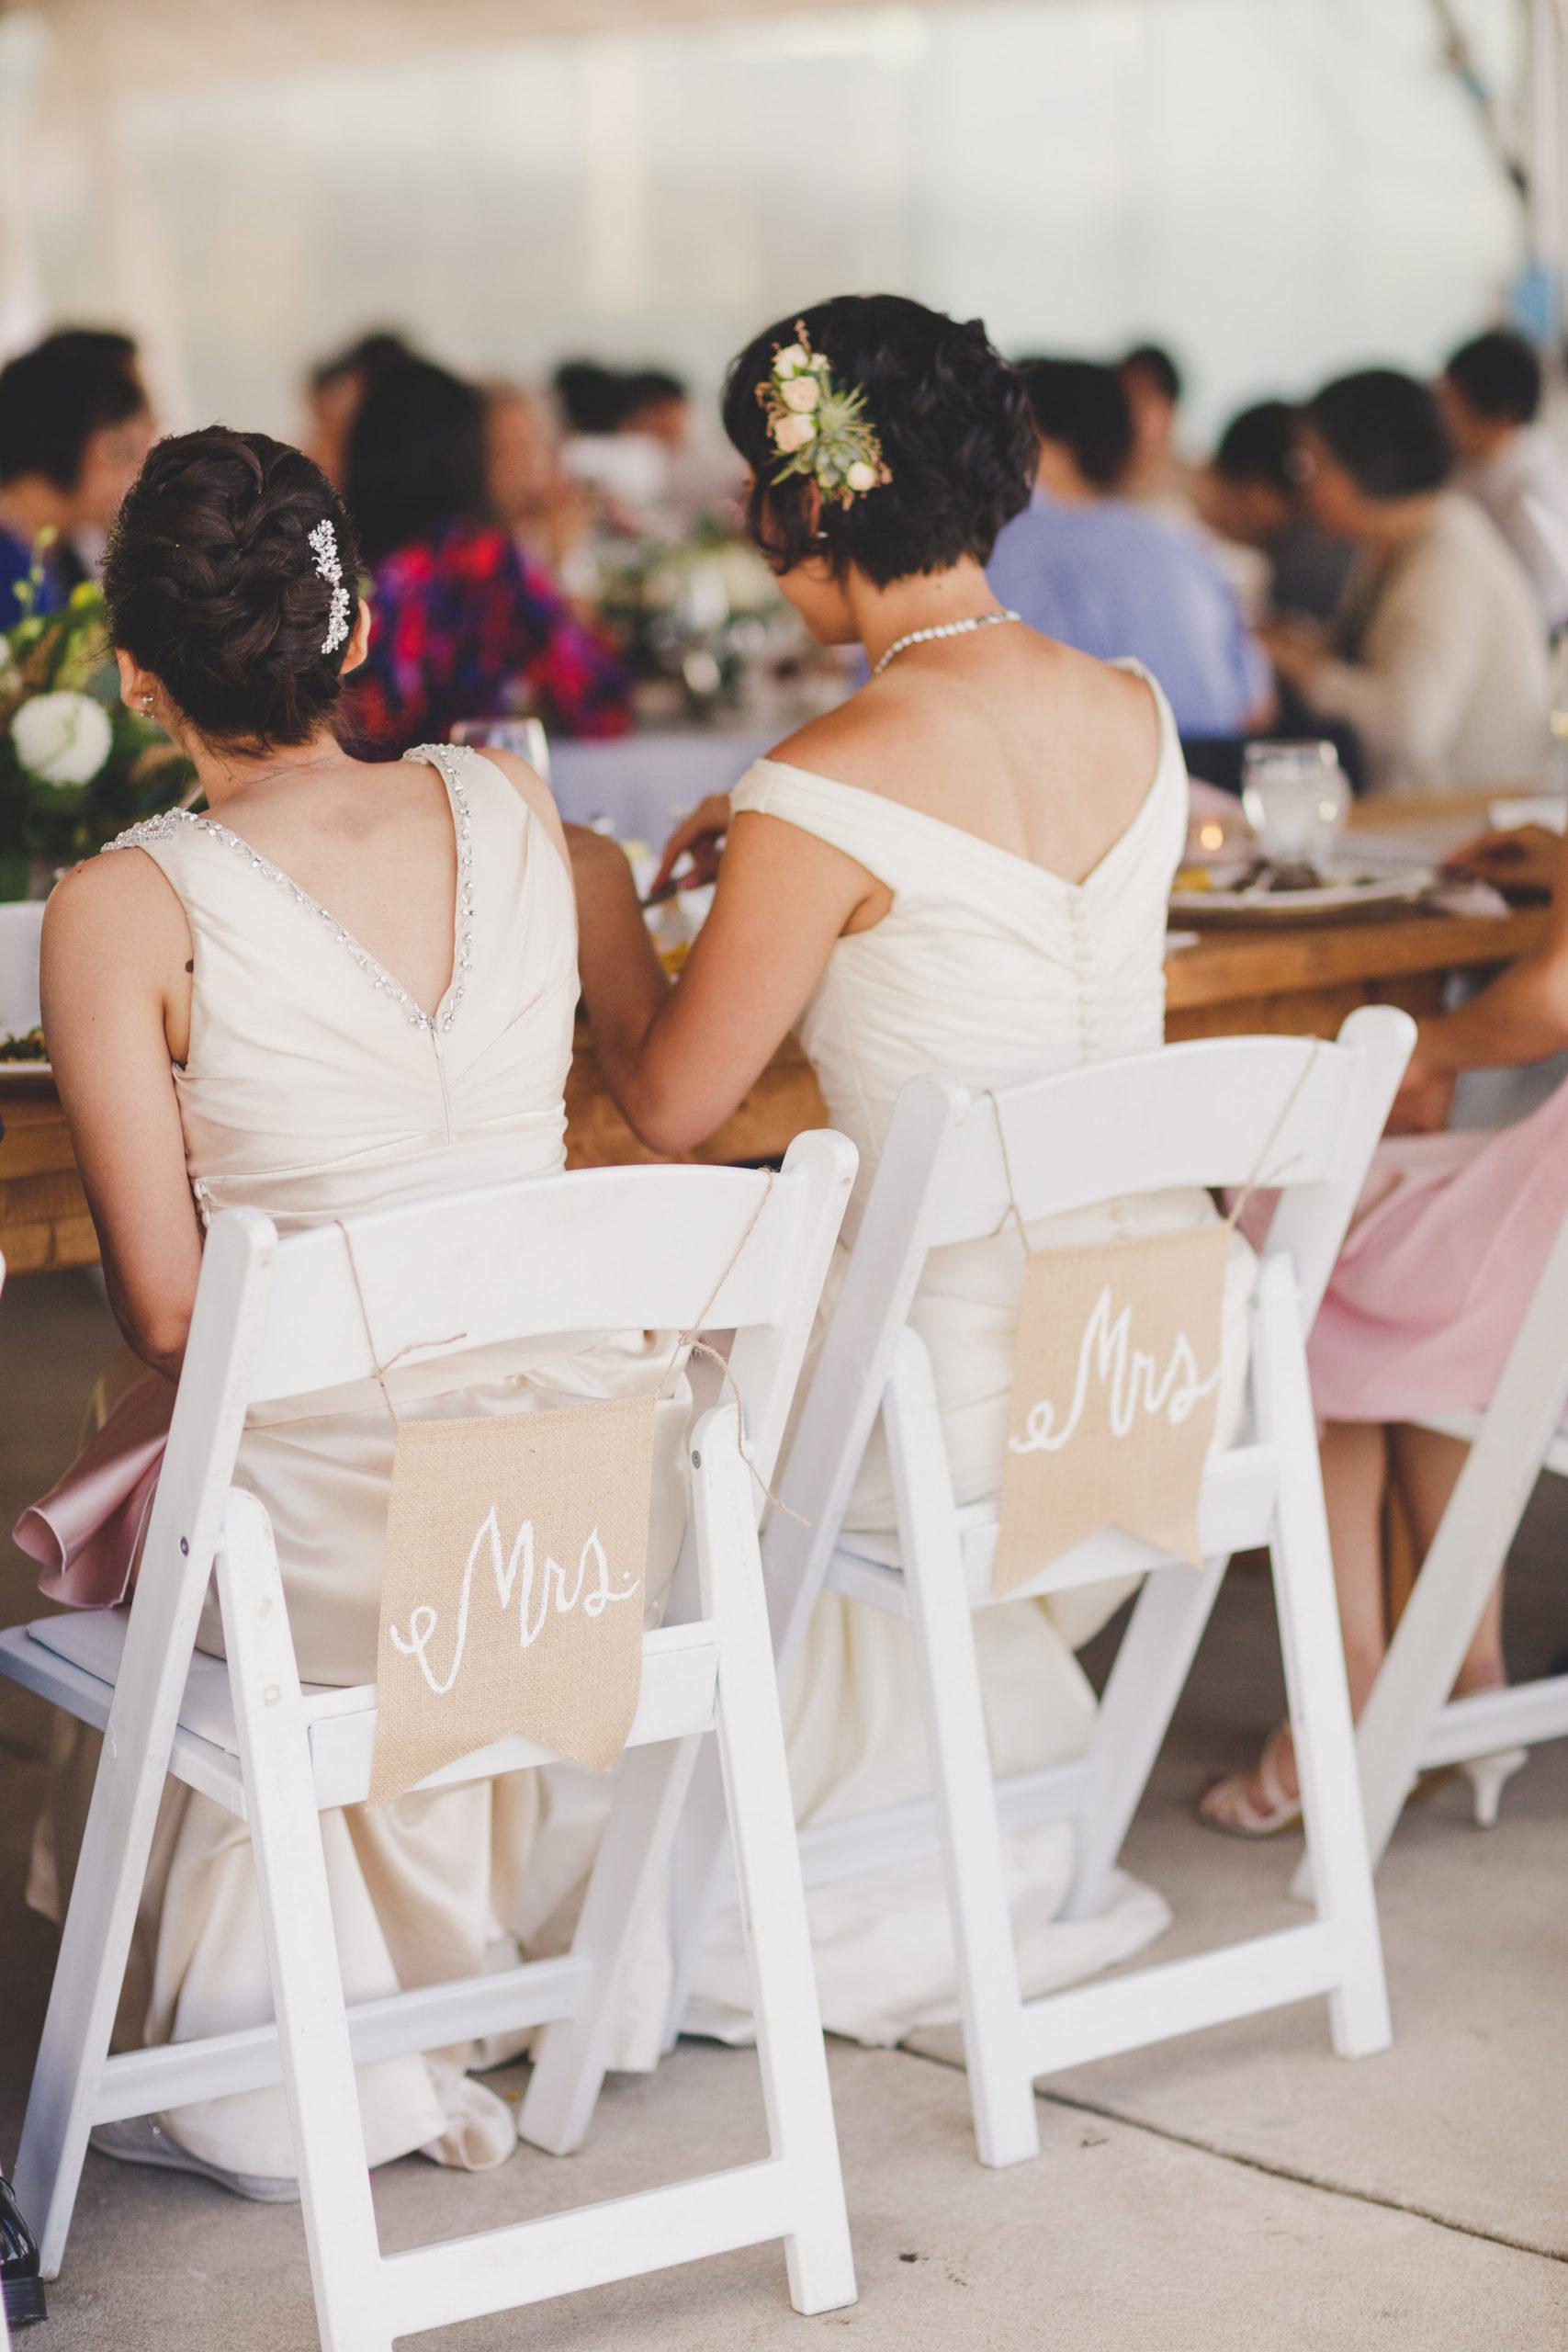 events by kristins wedding reception niagara on the lake